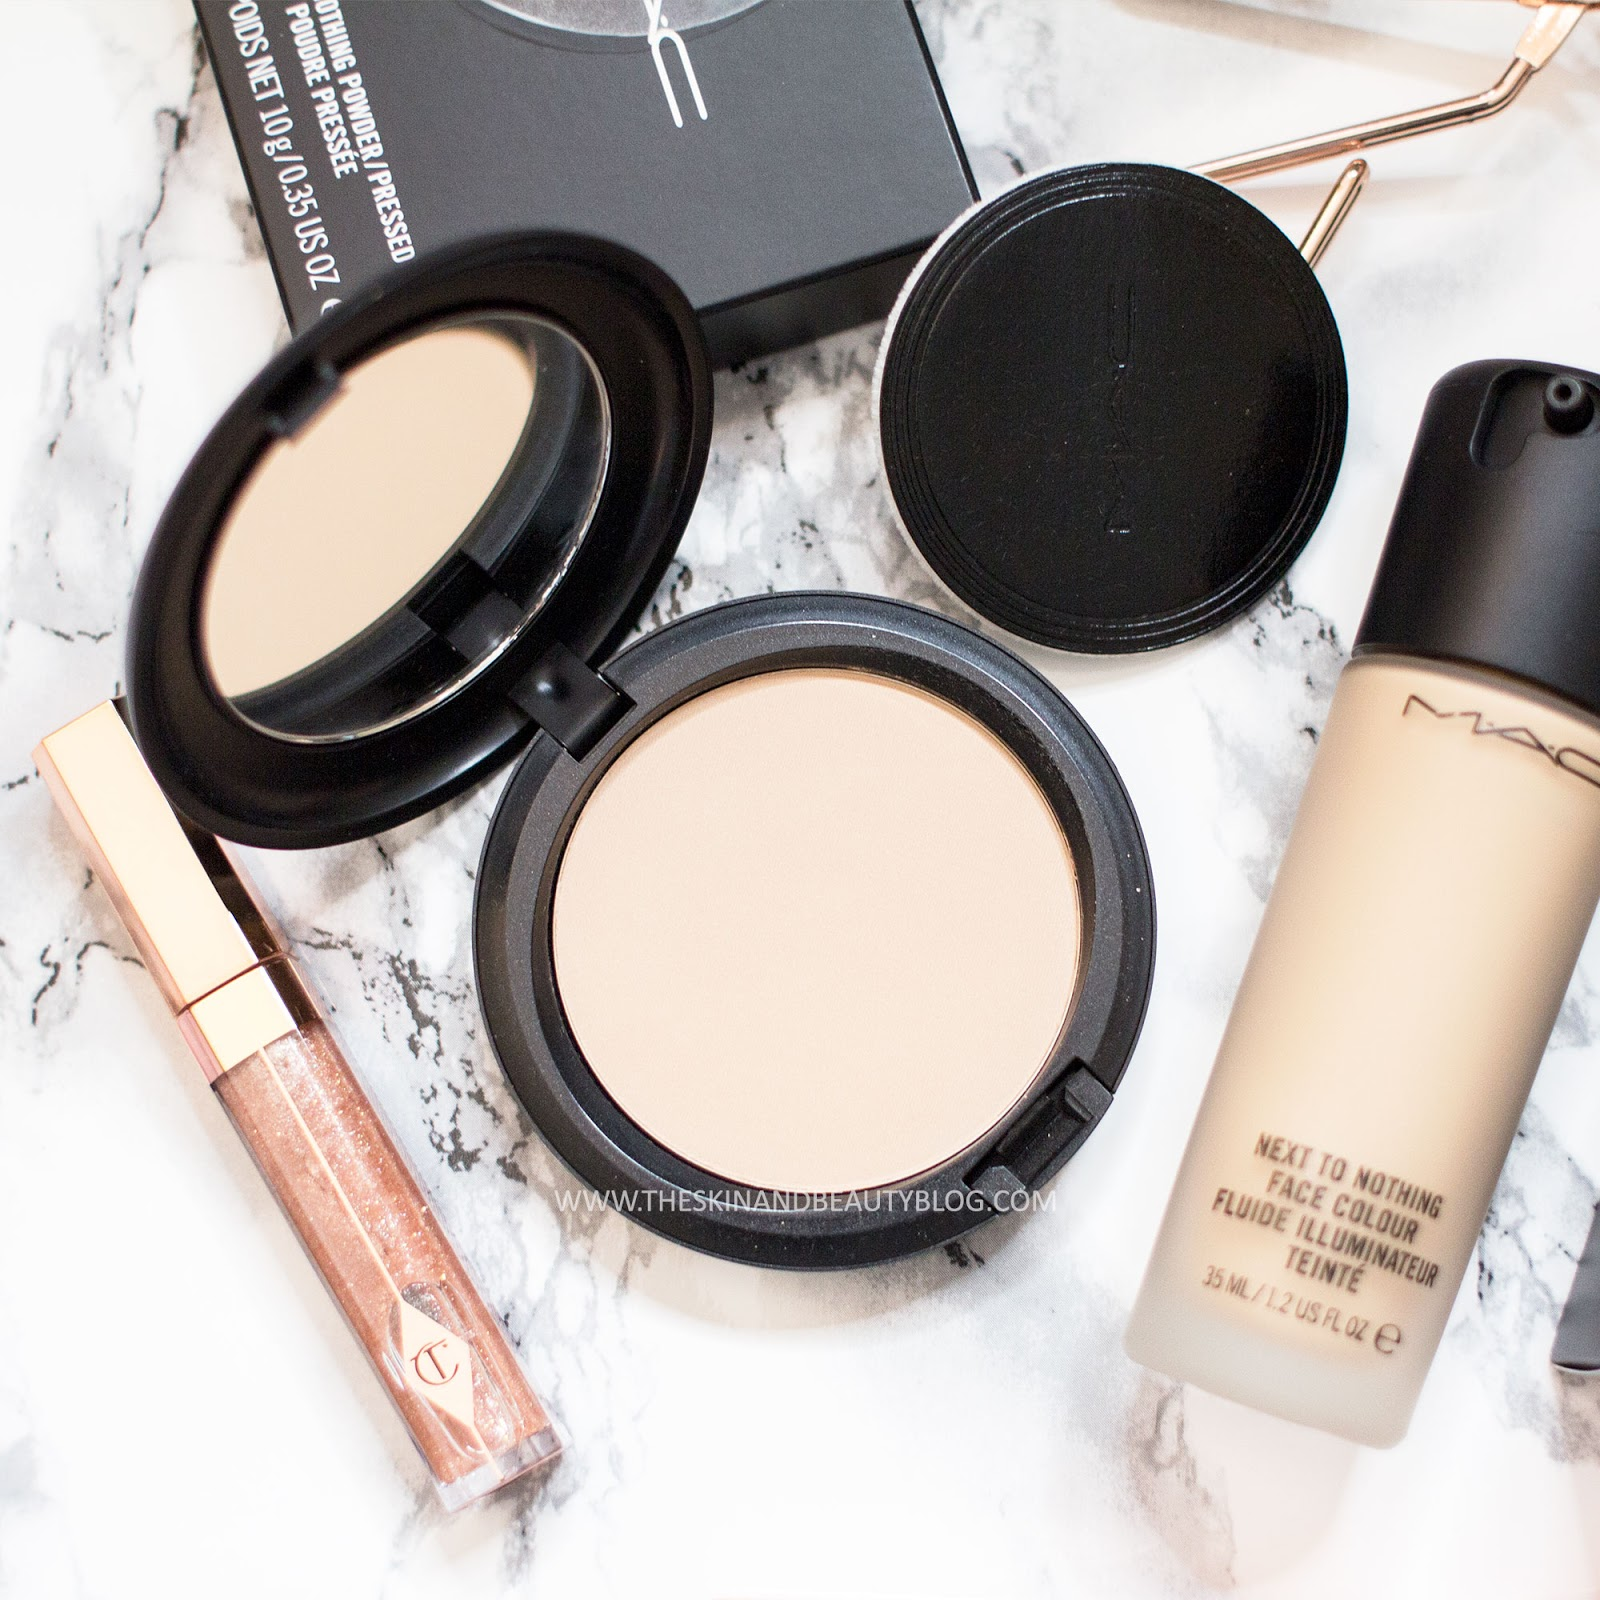 MAC Next To Nothing Powder Medium Plus Review, Swatches NC30